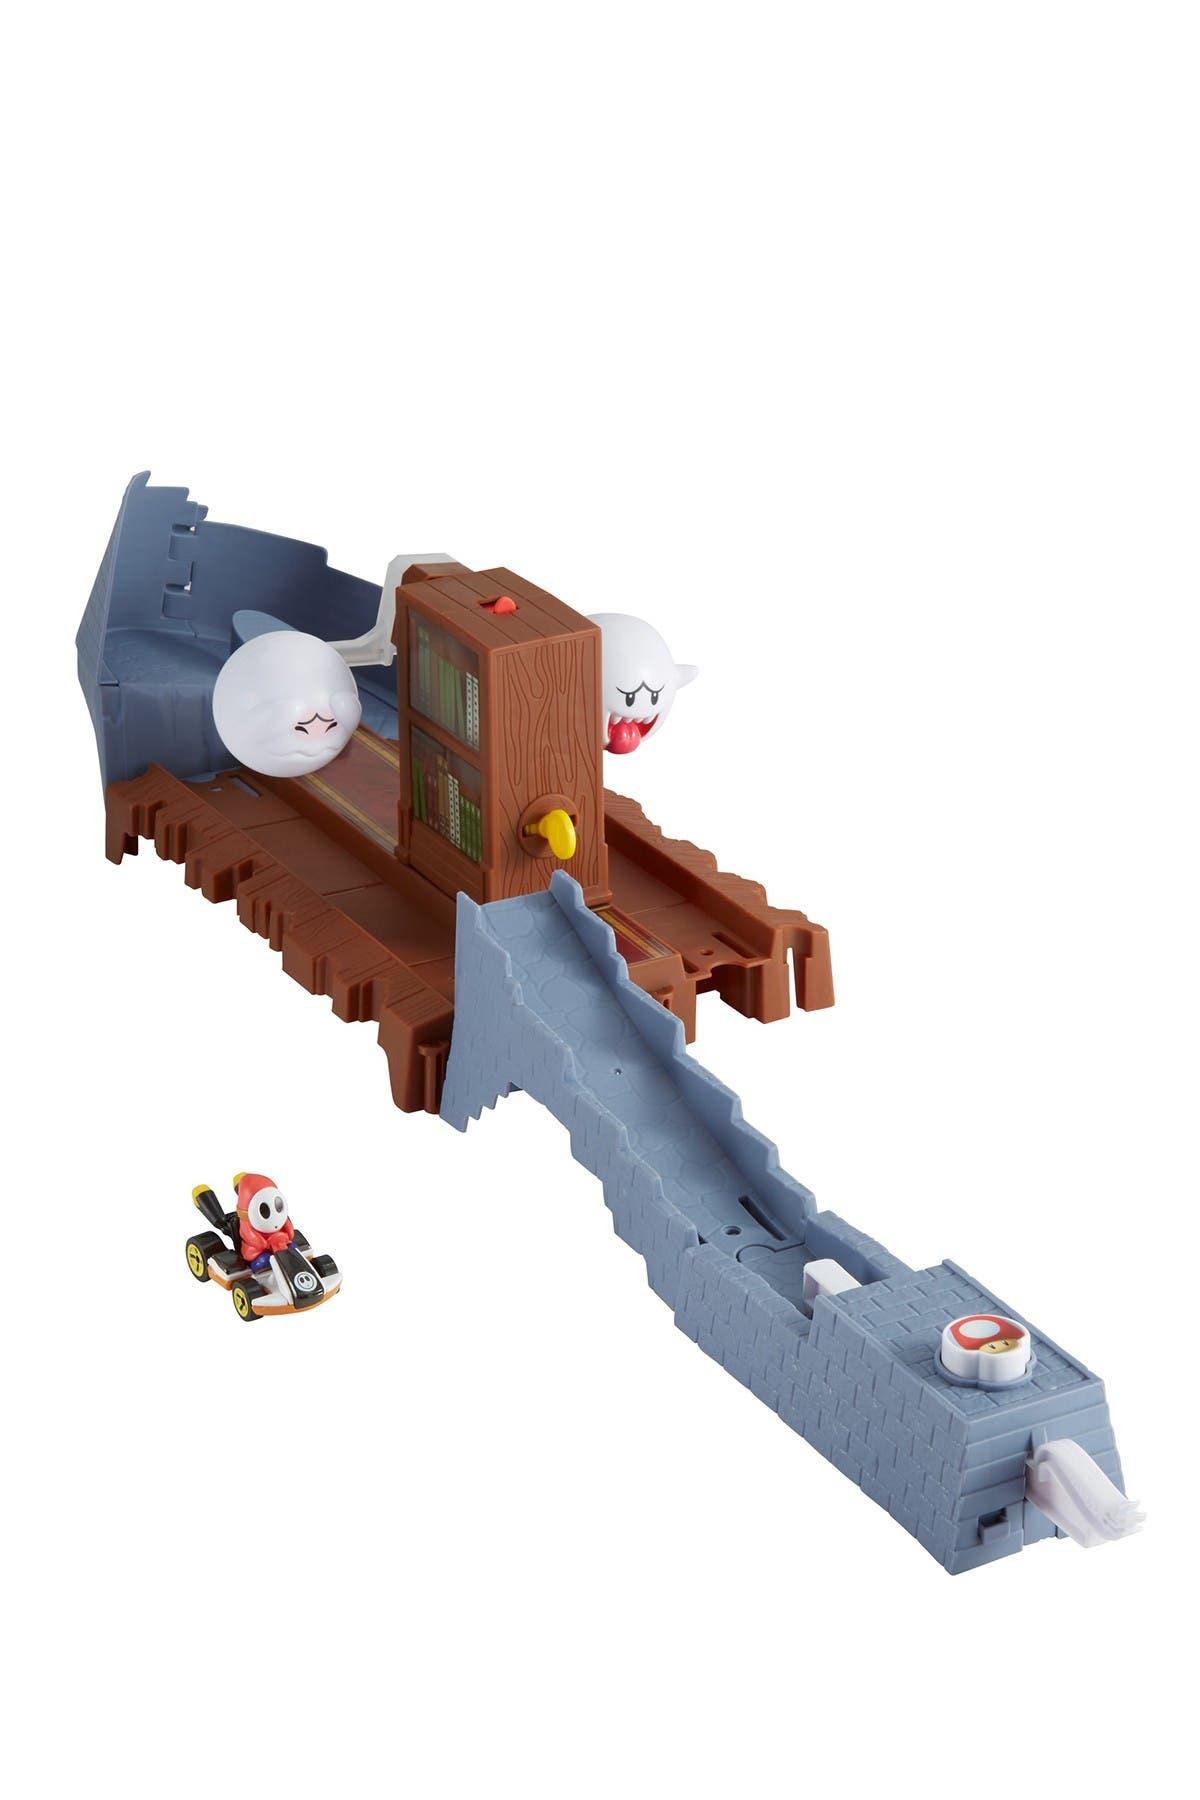 Image of Mattel Hot Wheels(R) Mario Kart(TM) Boo's Spooky Sprint Track Set